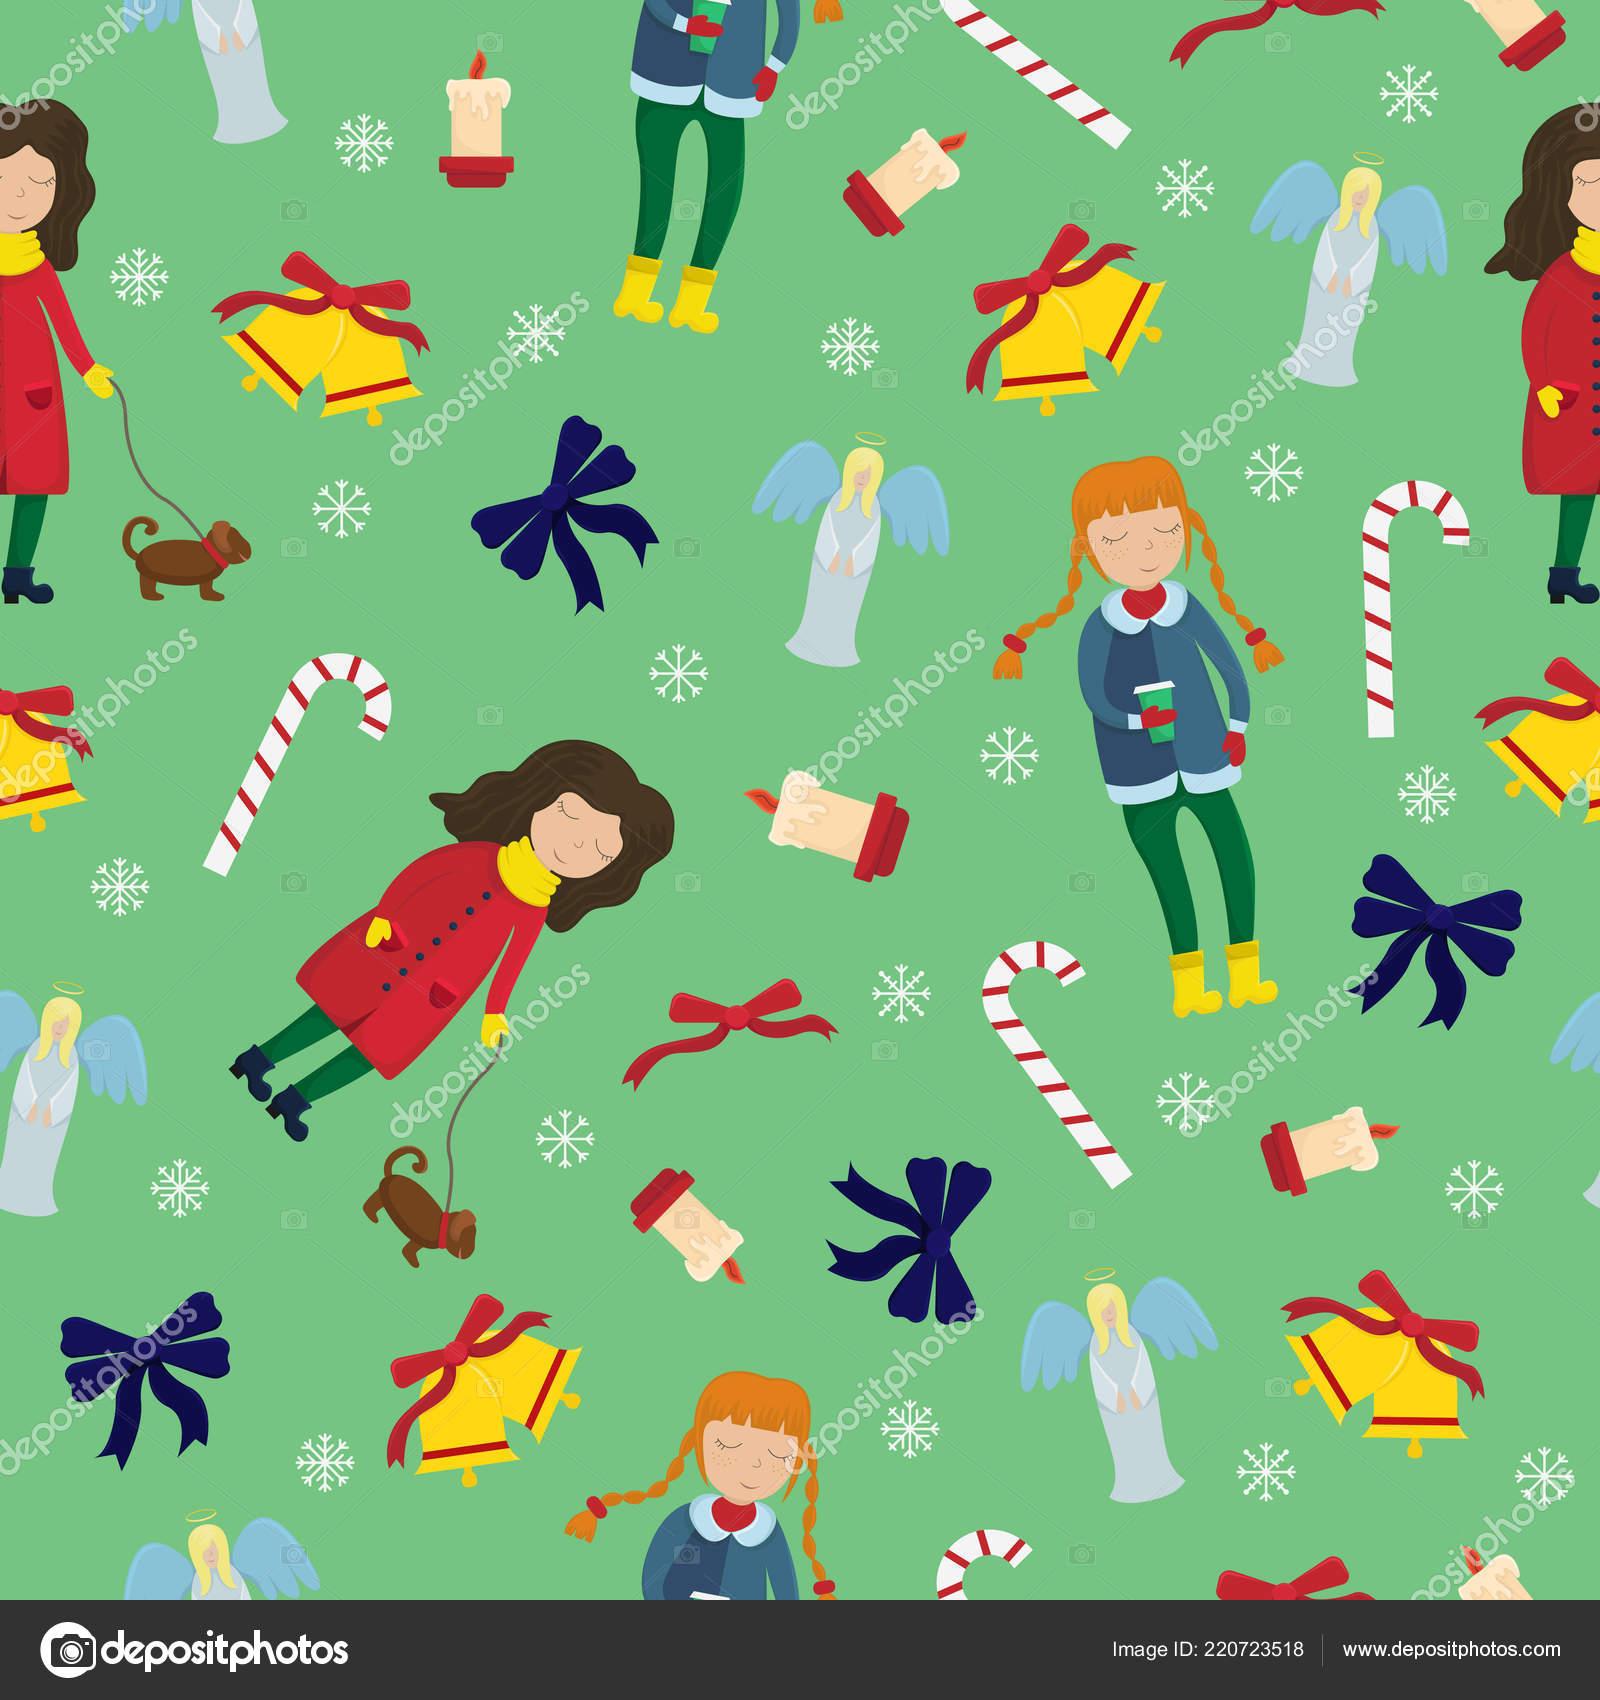 83e1694f576f New Year Sealmless Pattern Girls Winter Clothes Seasonal Elements ...